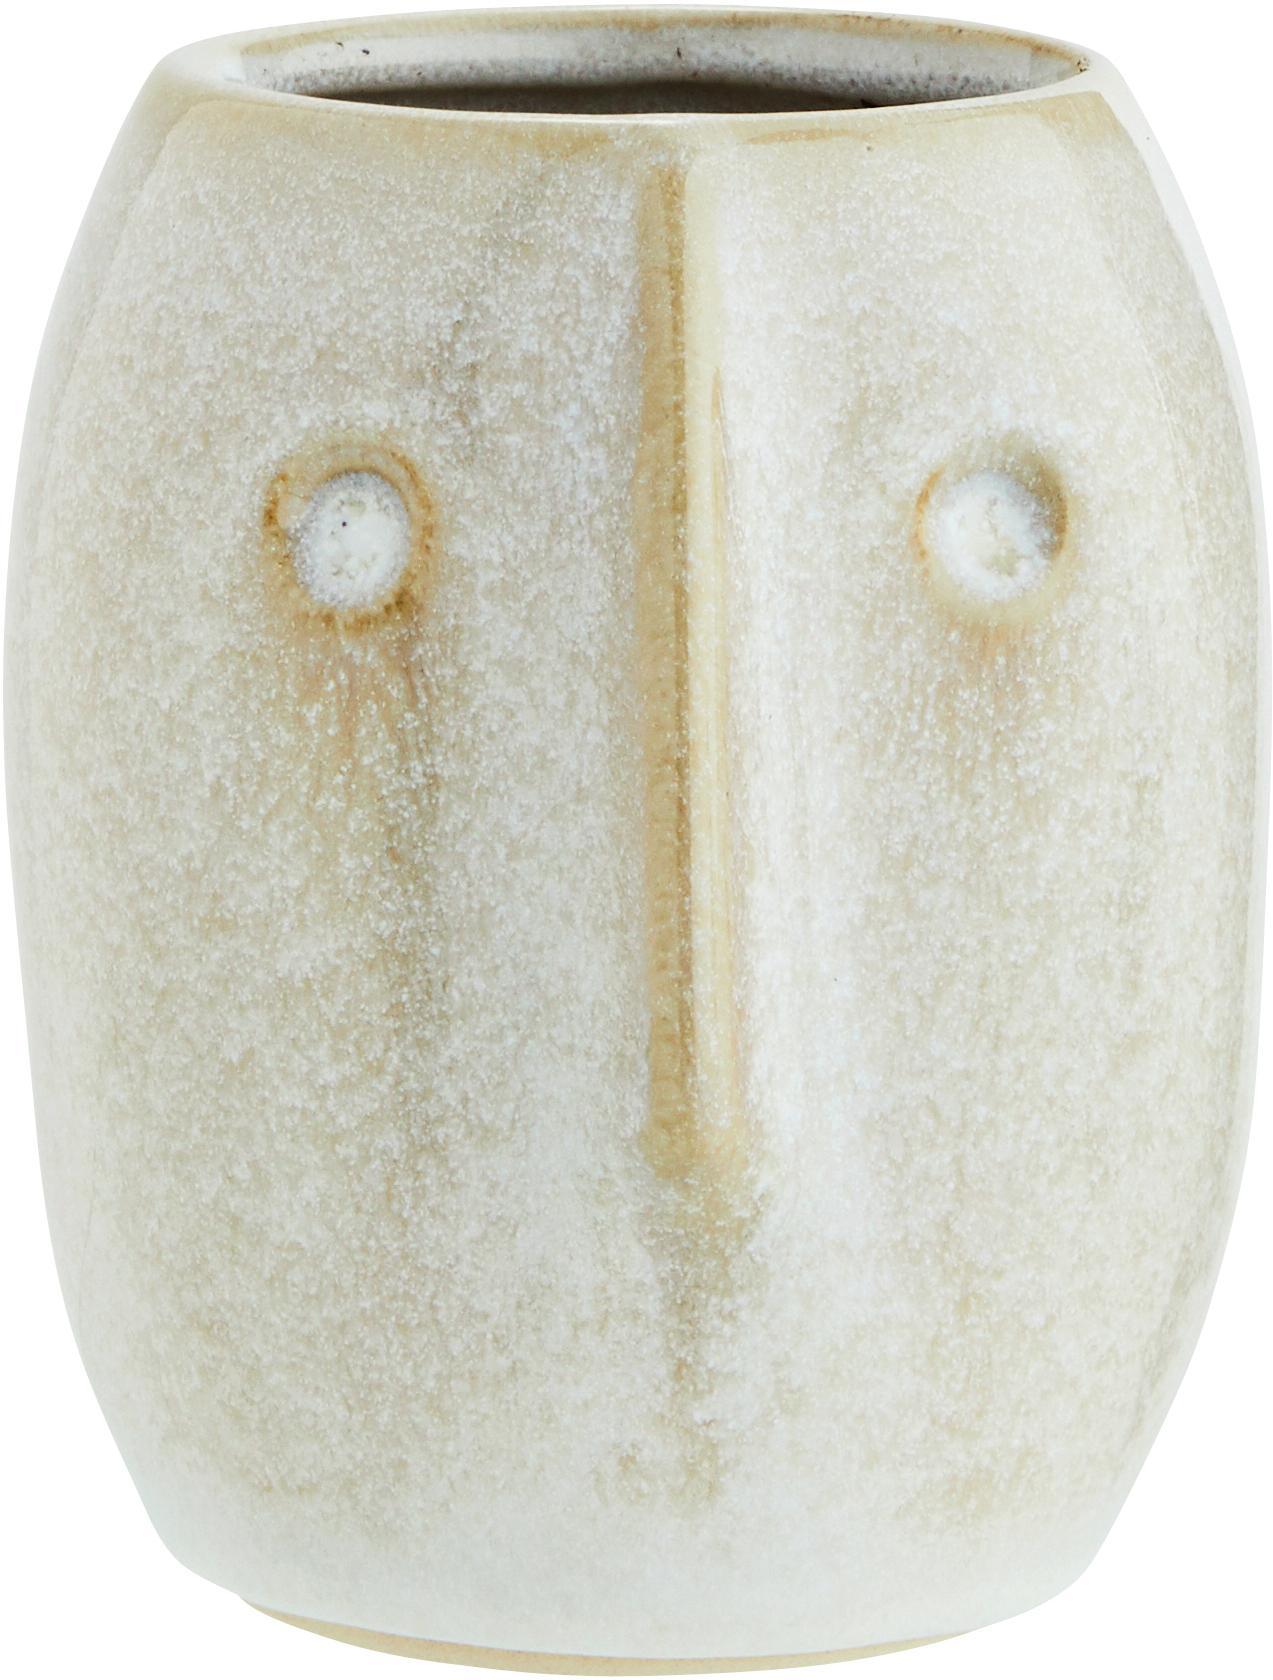 Portavaso Face, Terracotta, Bianco, beige, Ø 8 x Alt. 10 cm